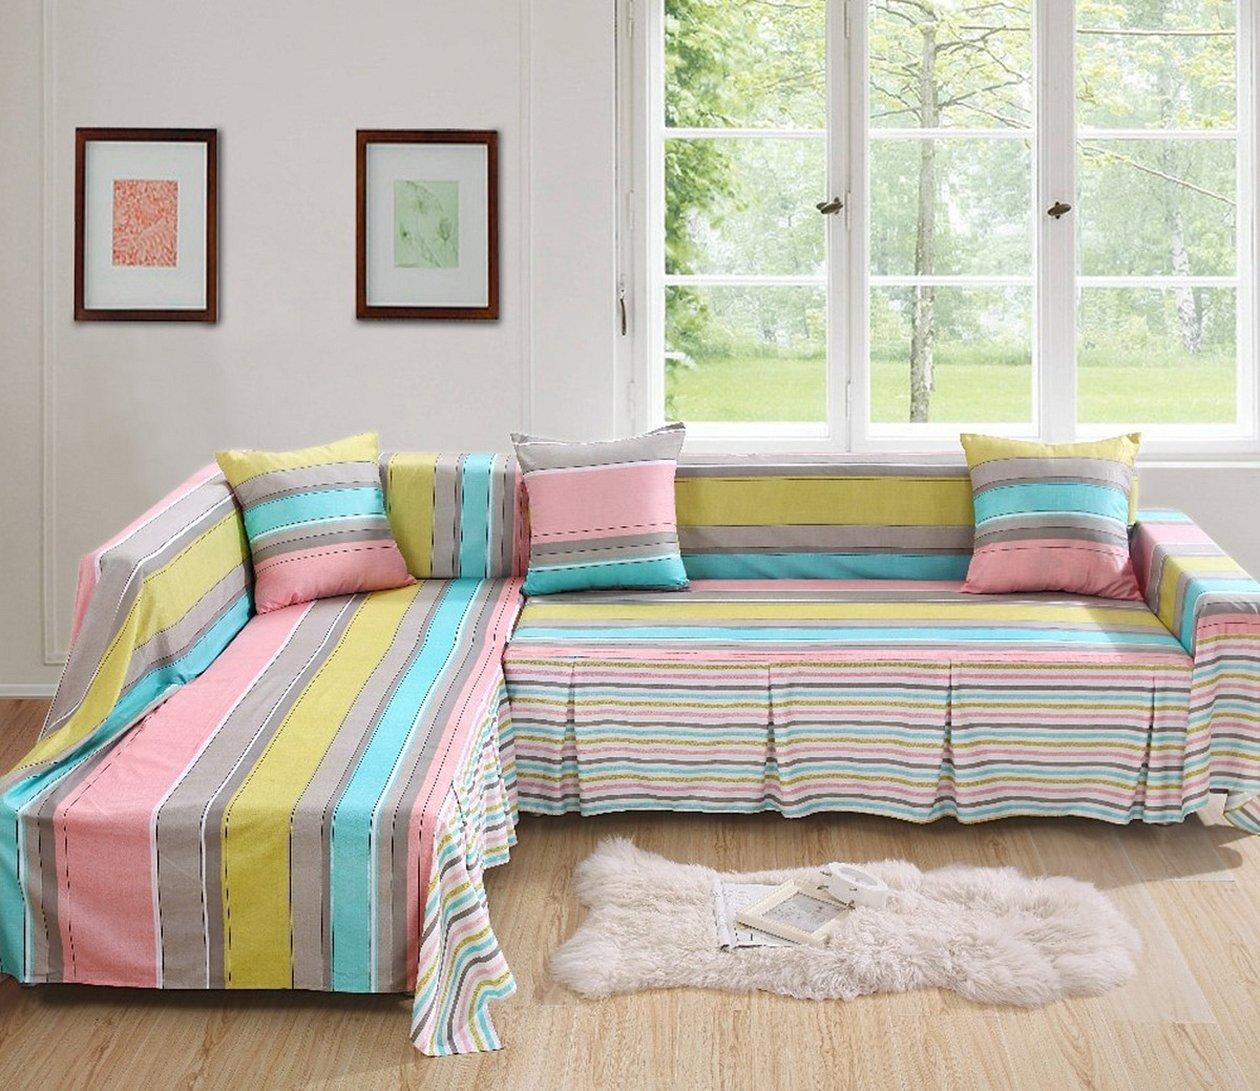 Чехол на подушки дивана в стиле пэчворк